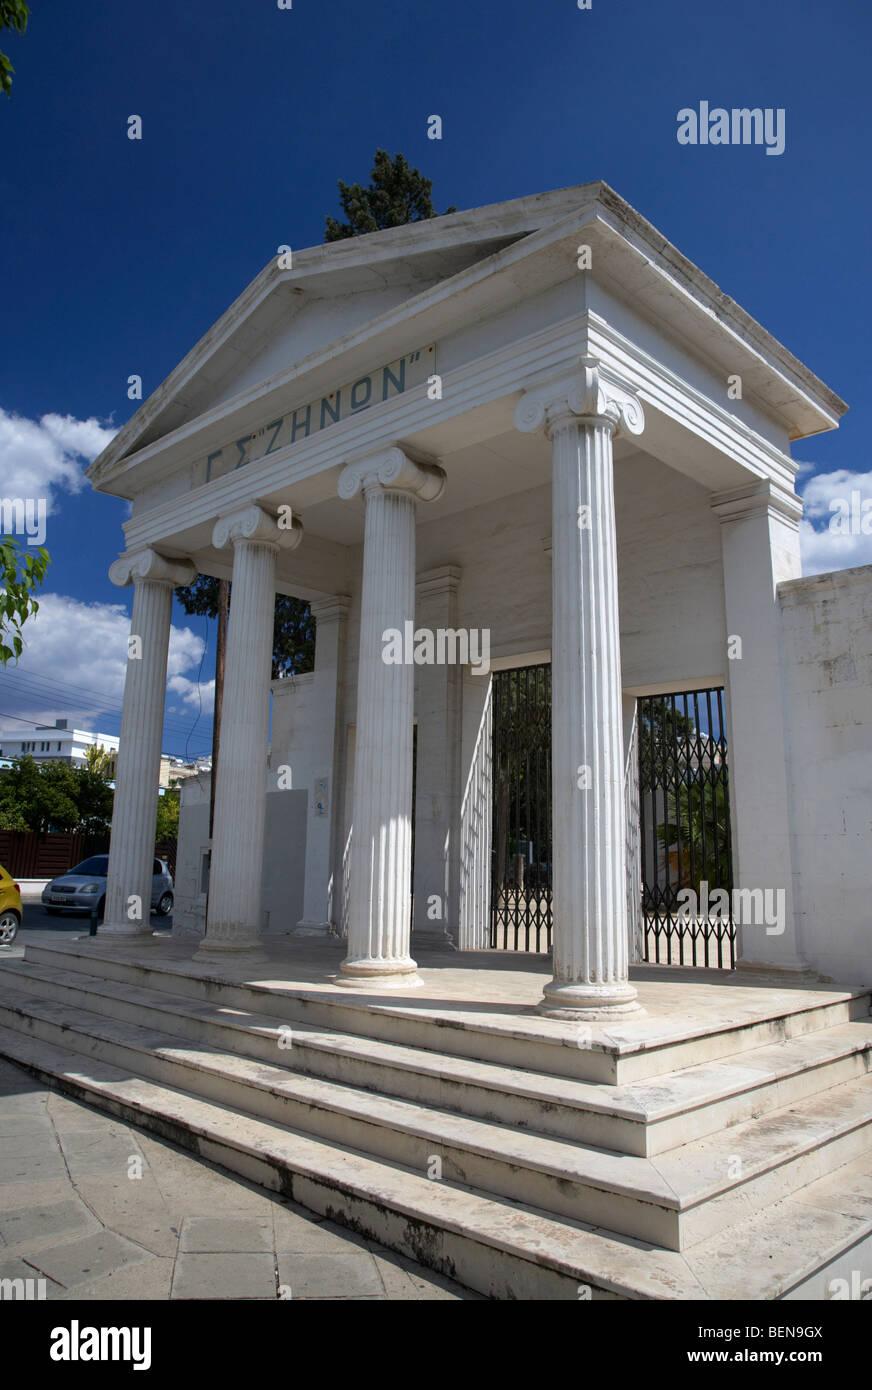 entrance to GSZ or Zenon stadium larnaca republic of cyprus europe - Stock Image